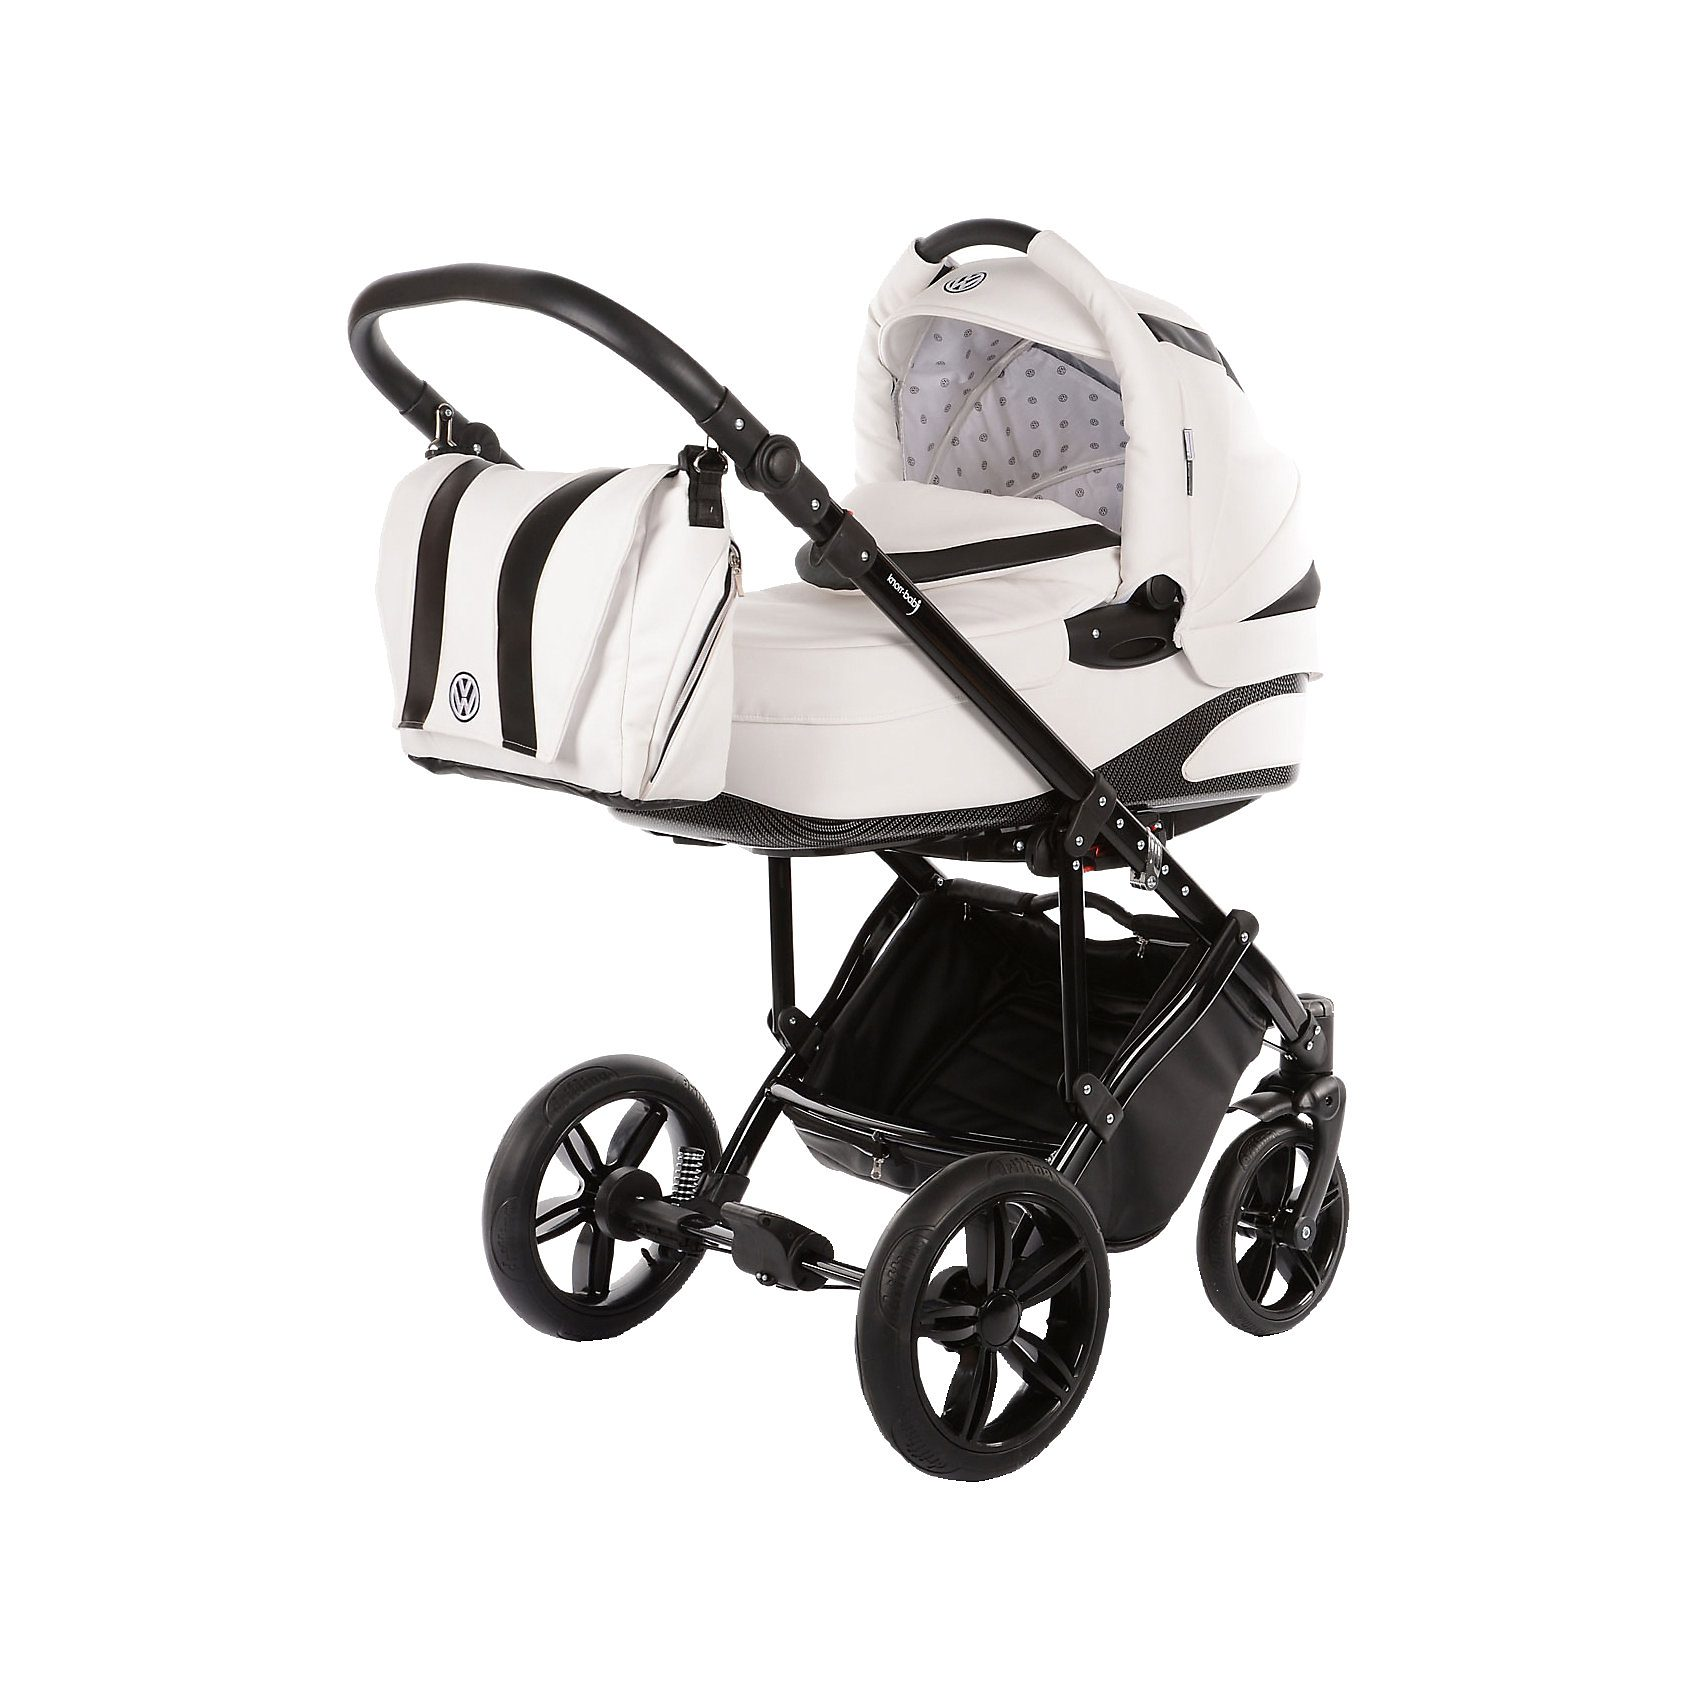 knorr-baby Kombi Kinderwagen Volkswagen Carbon, weiß